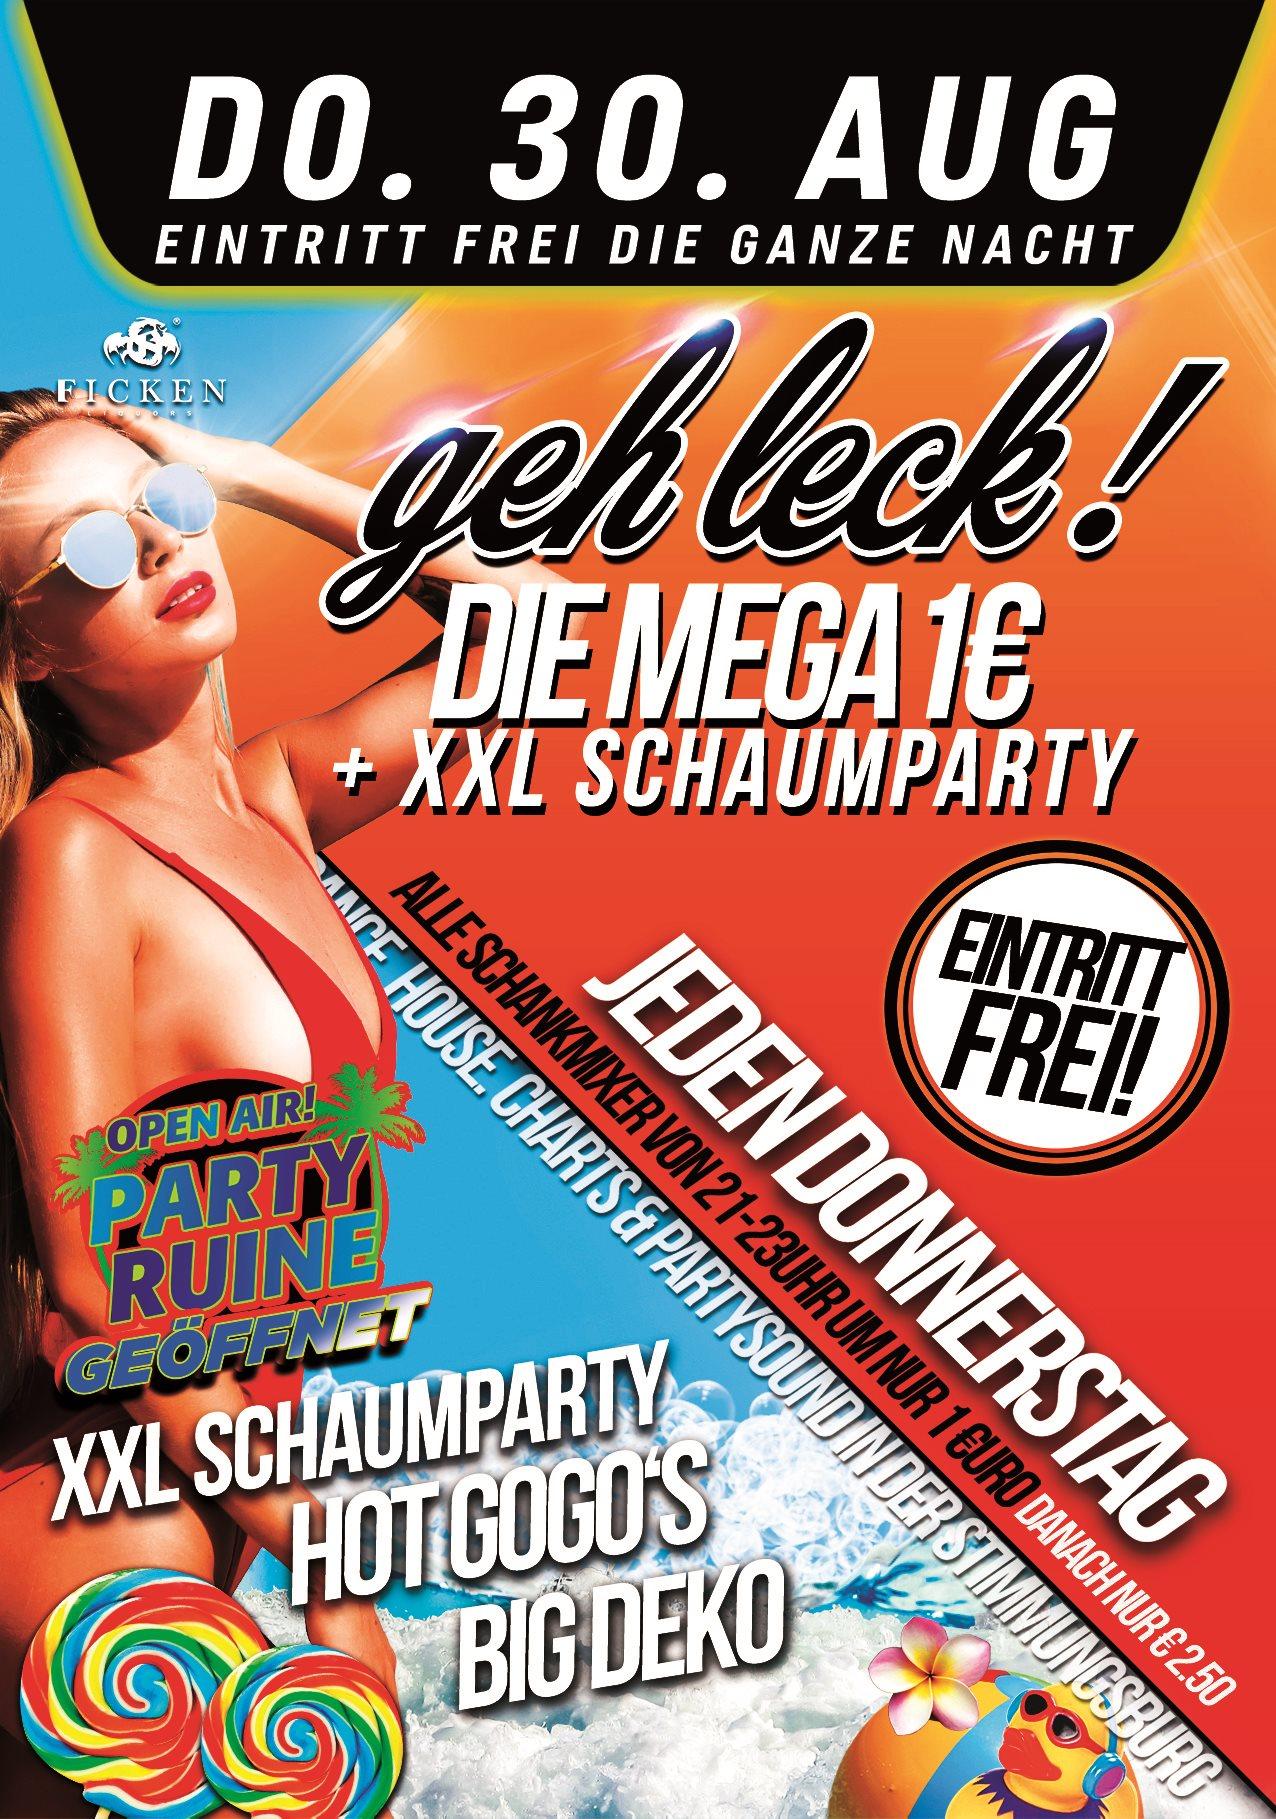 Geh Leck! Die Mega 1€ Party + XXL SCHAUMPARTY